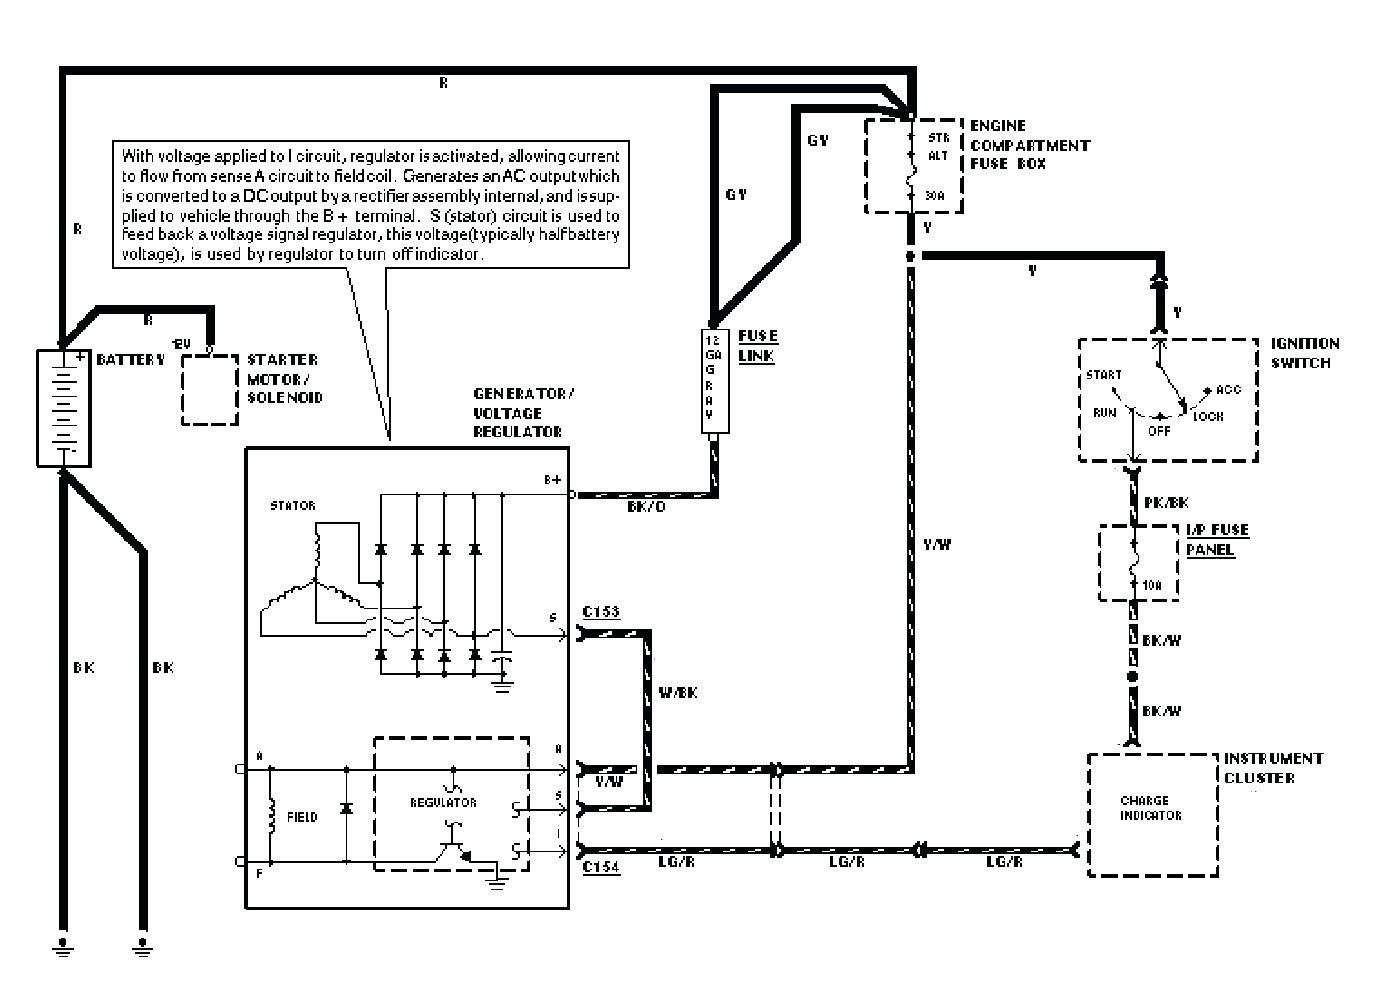 fender highway one wiring diagram internal regulator alternator